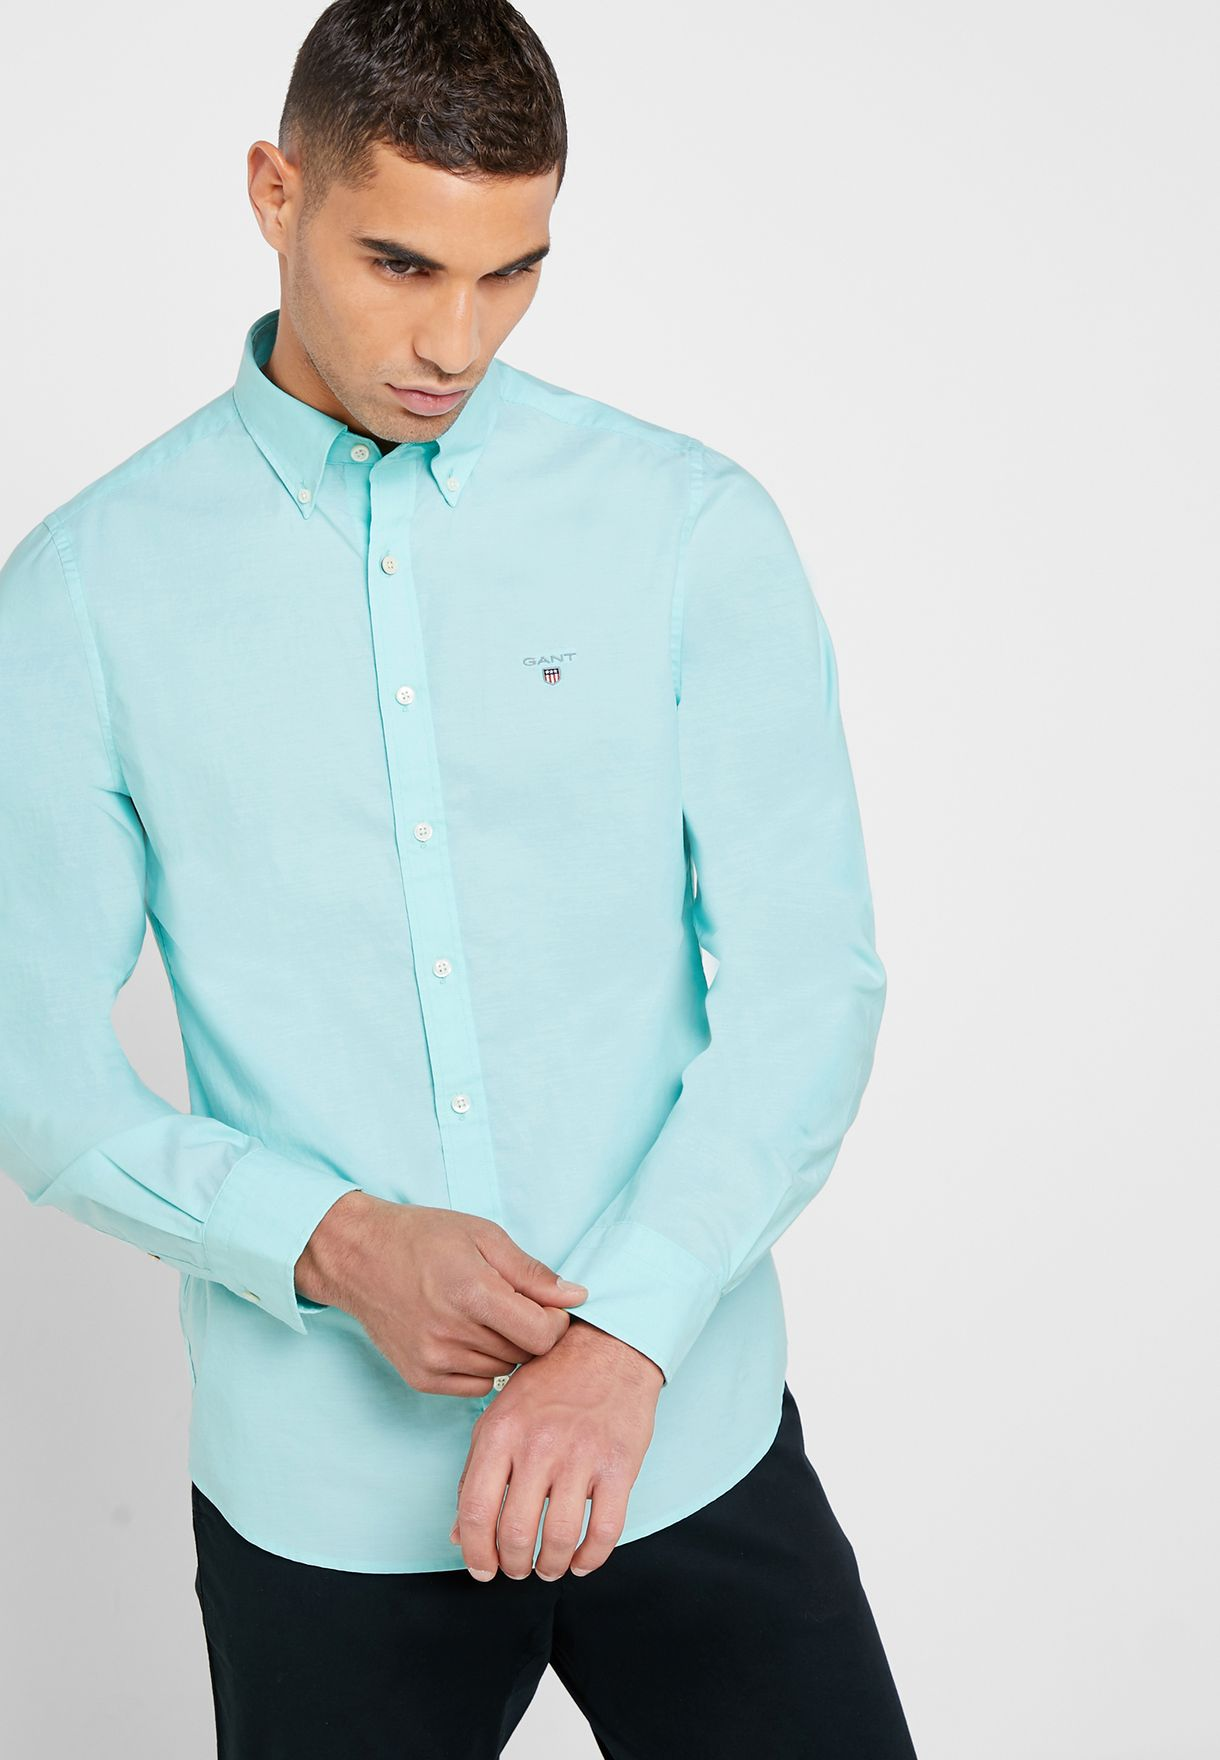 huippumuoti uk halpa myynti aito The Broadcloth Shirt